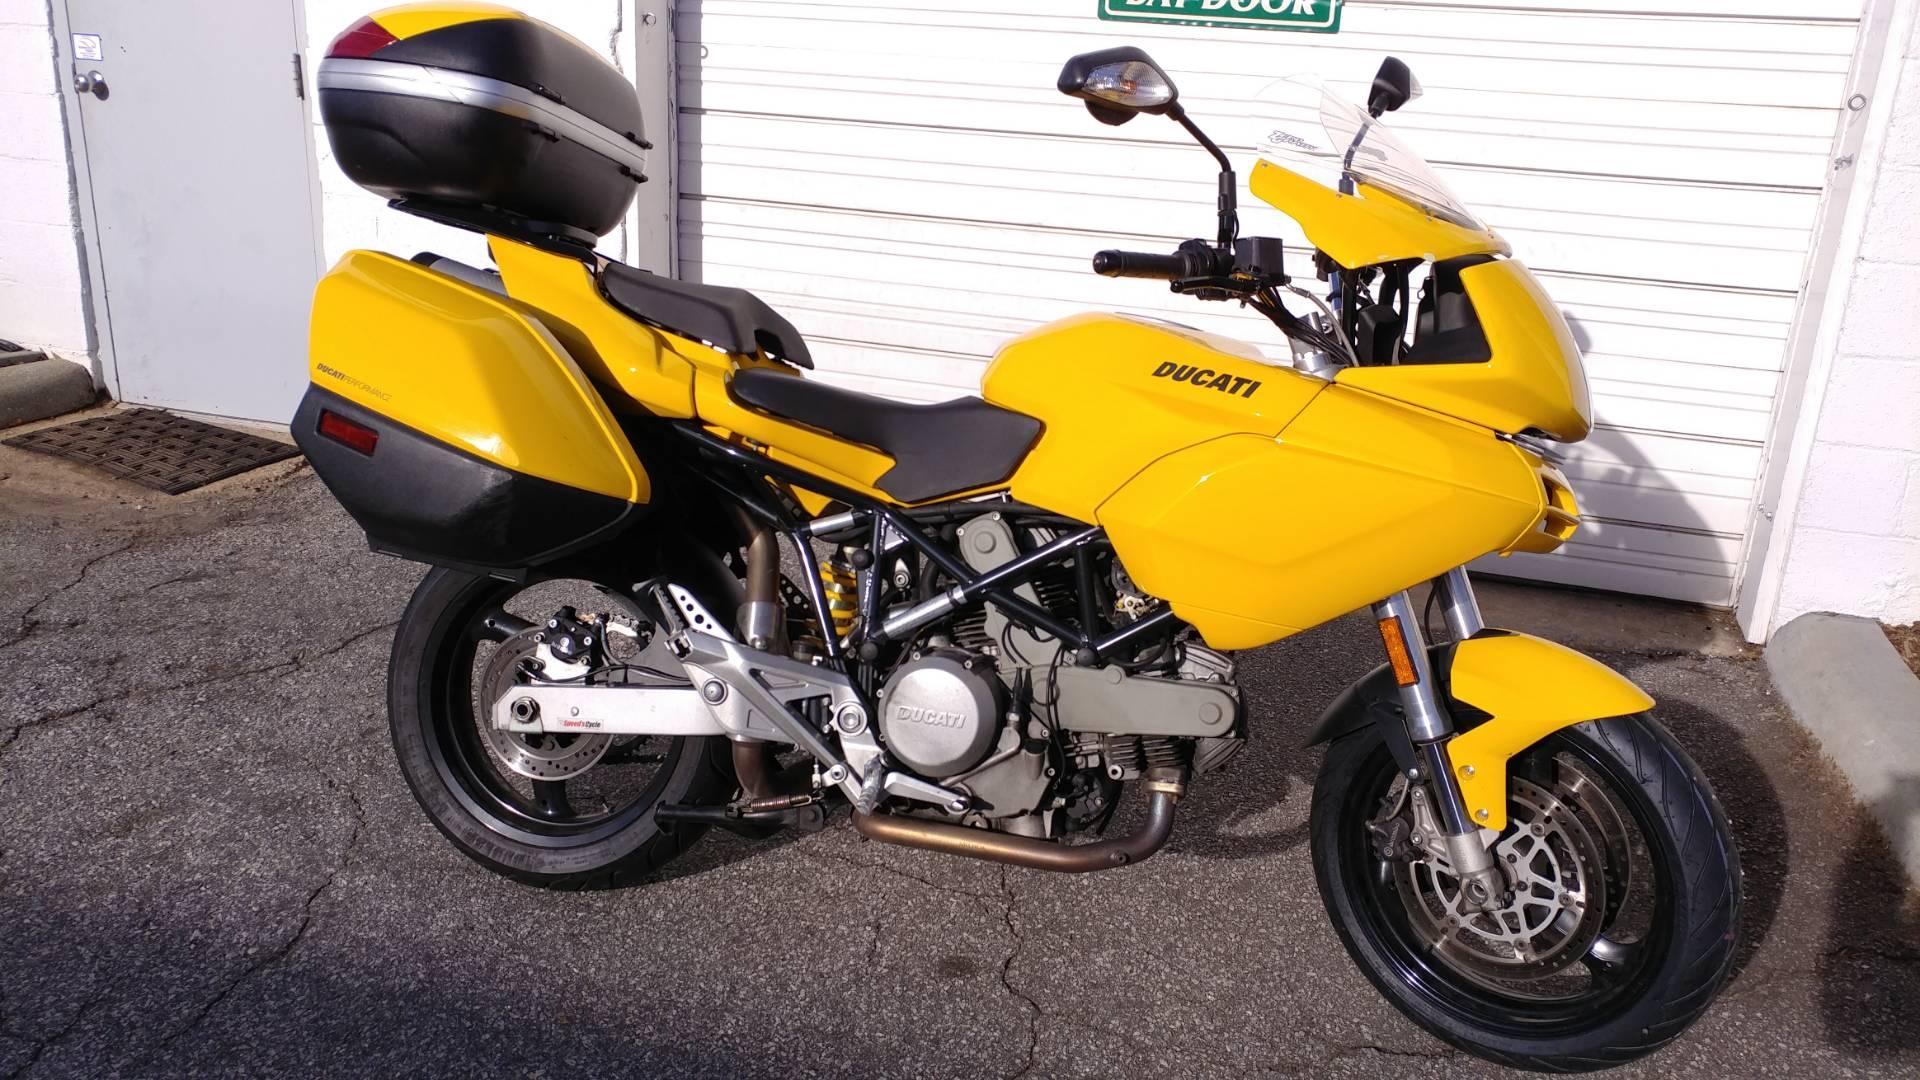 2006 Ducati 2006 Multistrada 620 Sport Touring in Greenville, South Carolina